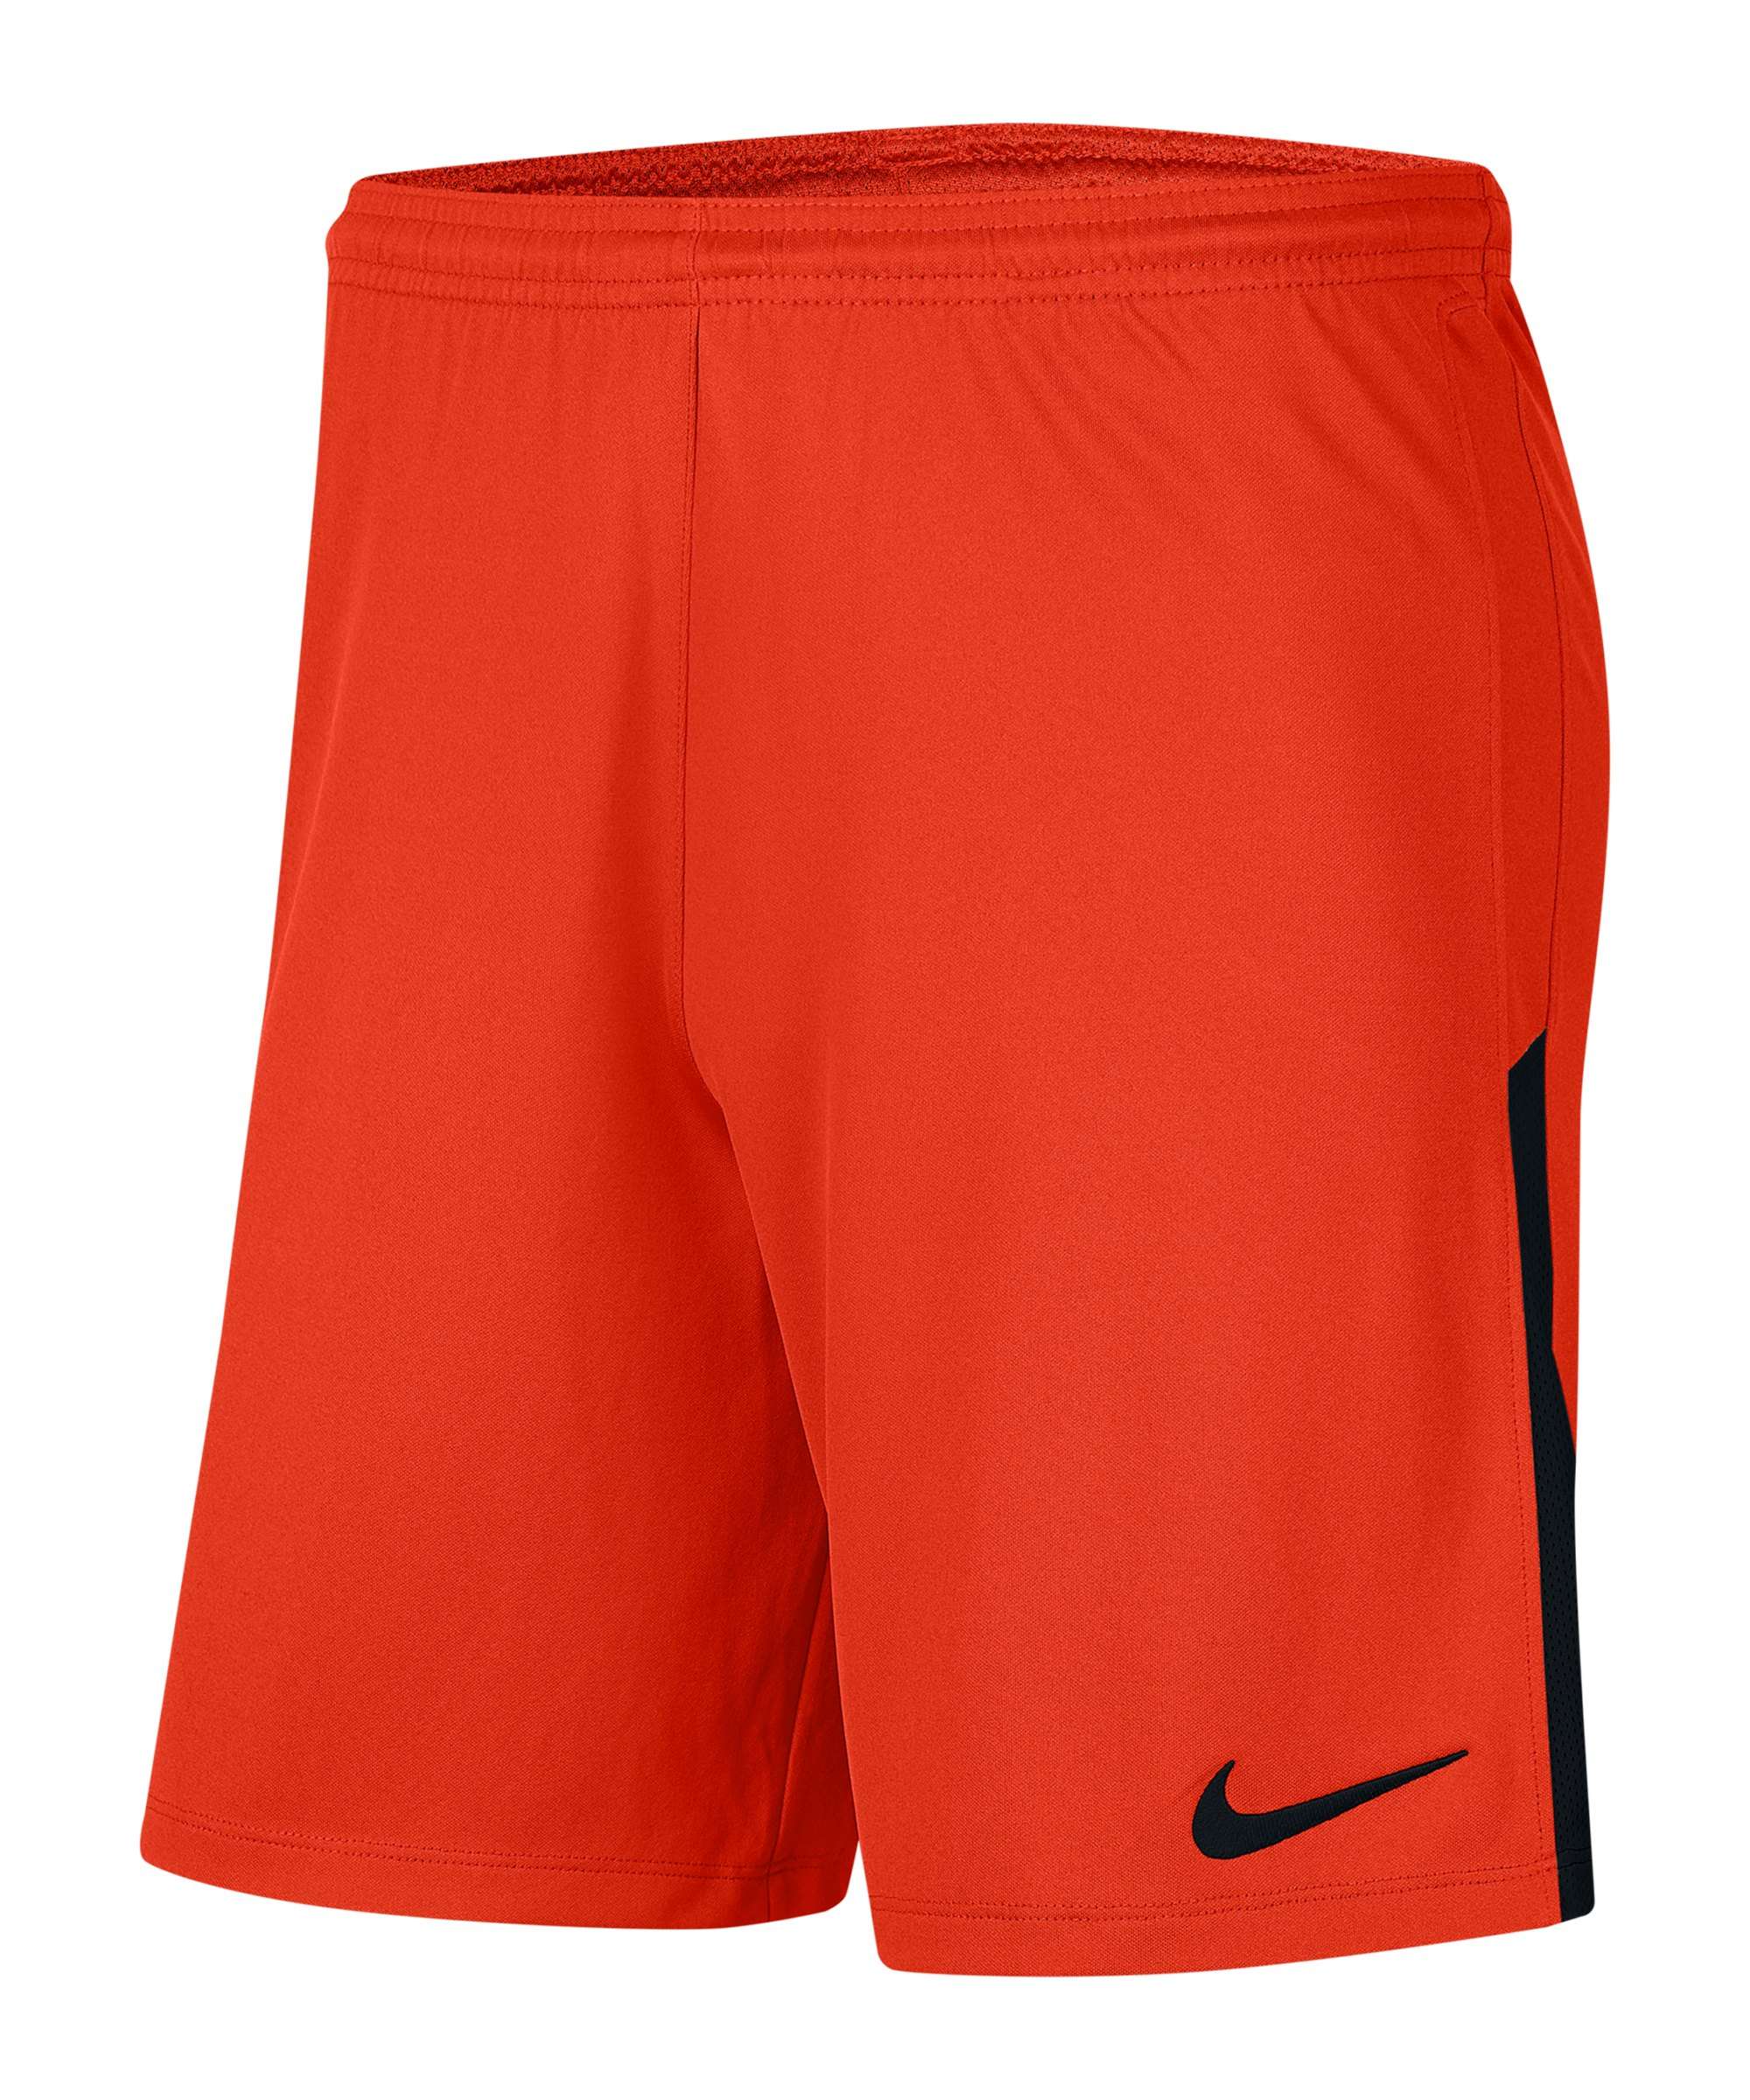 Nike League Knit II Short Orange F891 - orange